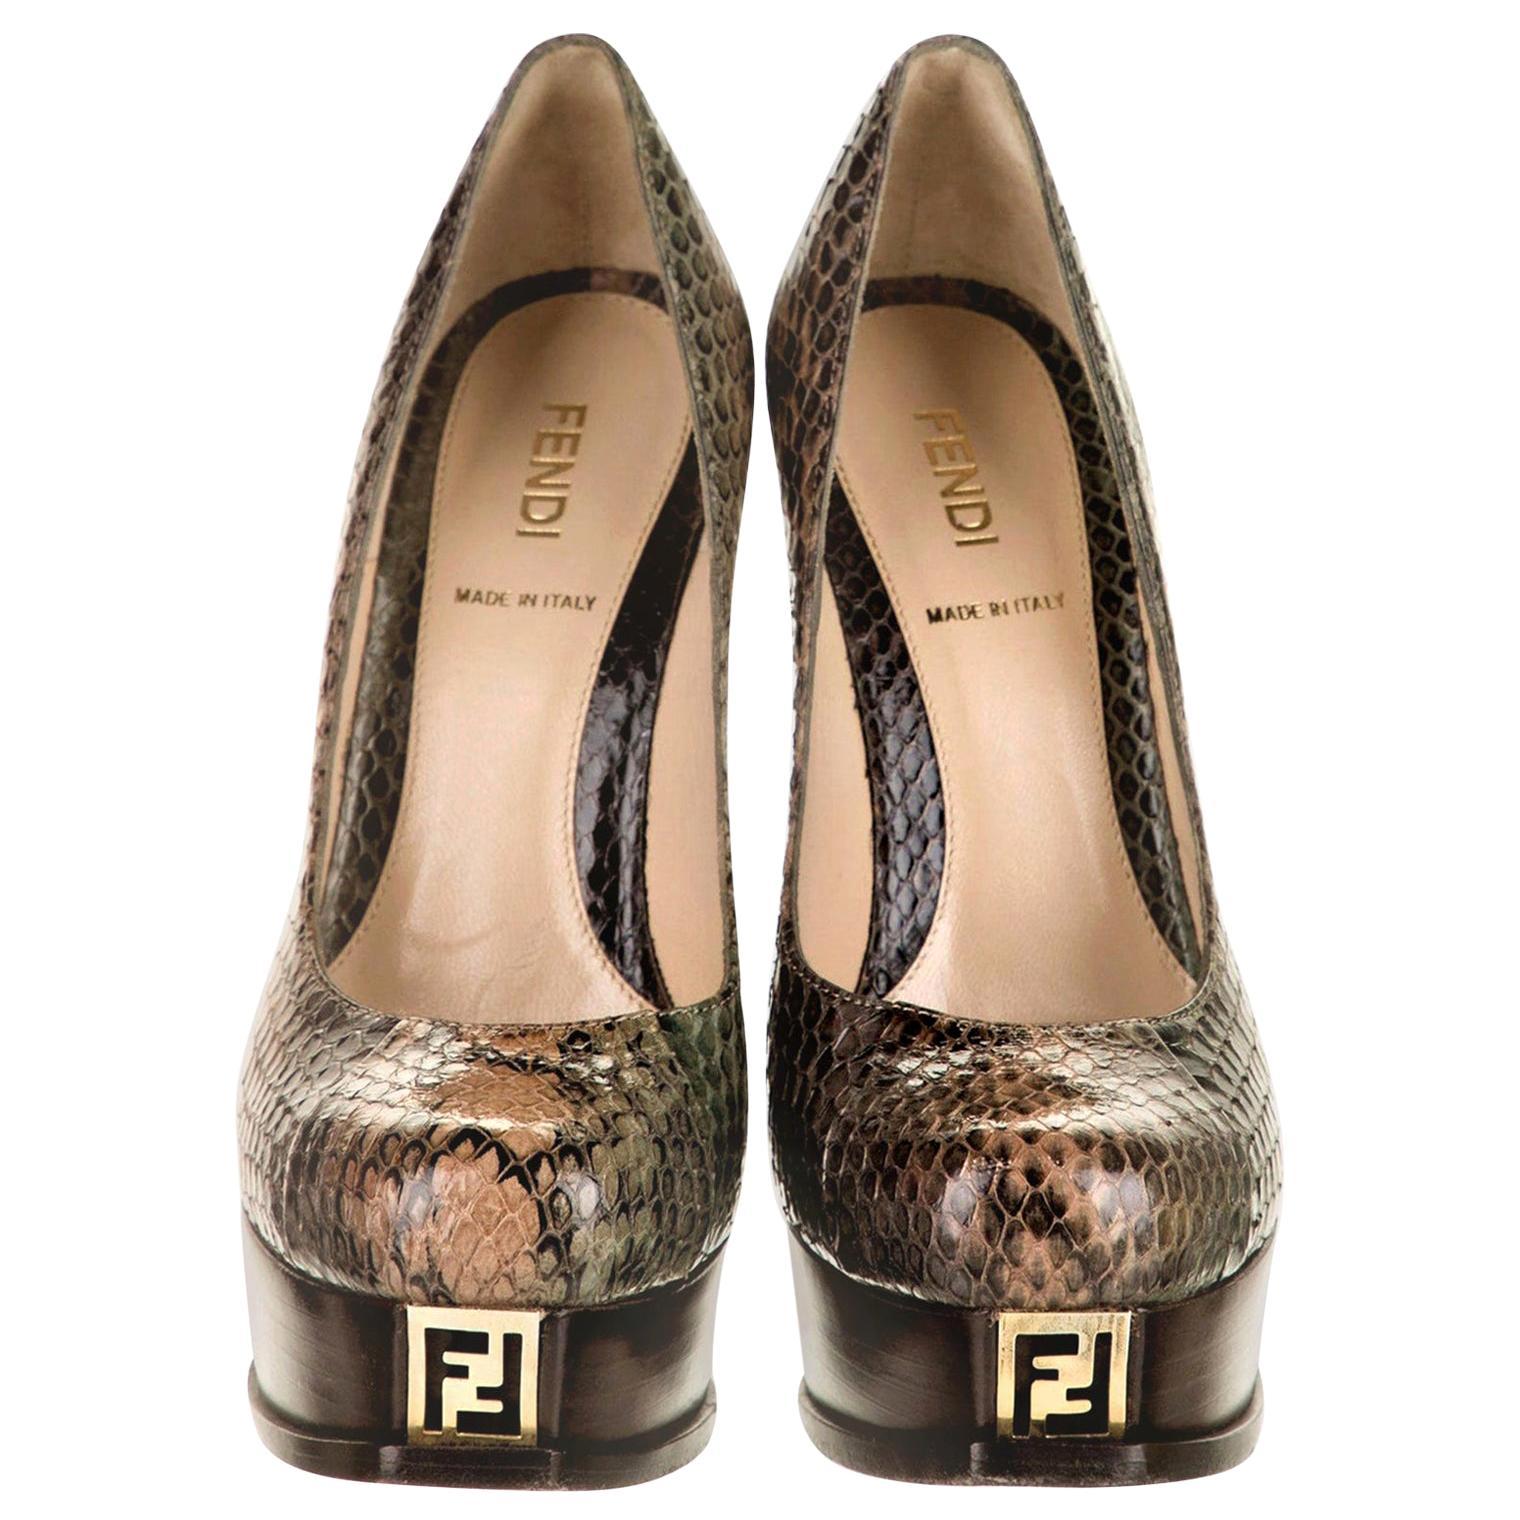 New Fendi Karl Lagerfeld Python Heels Platform Pumps Sz 36